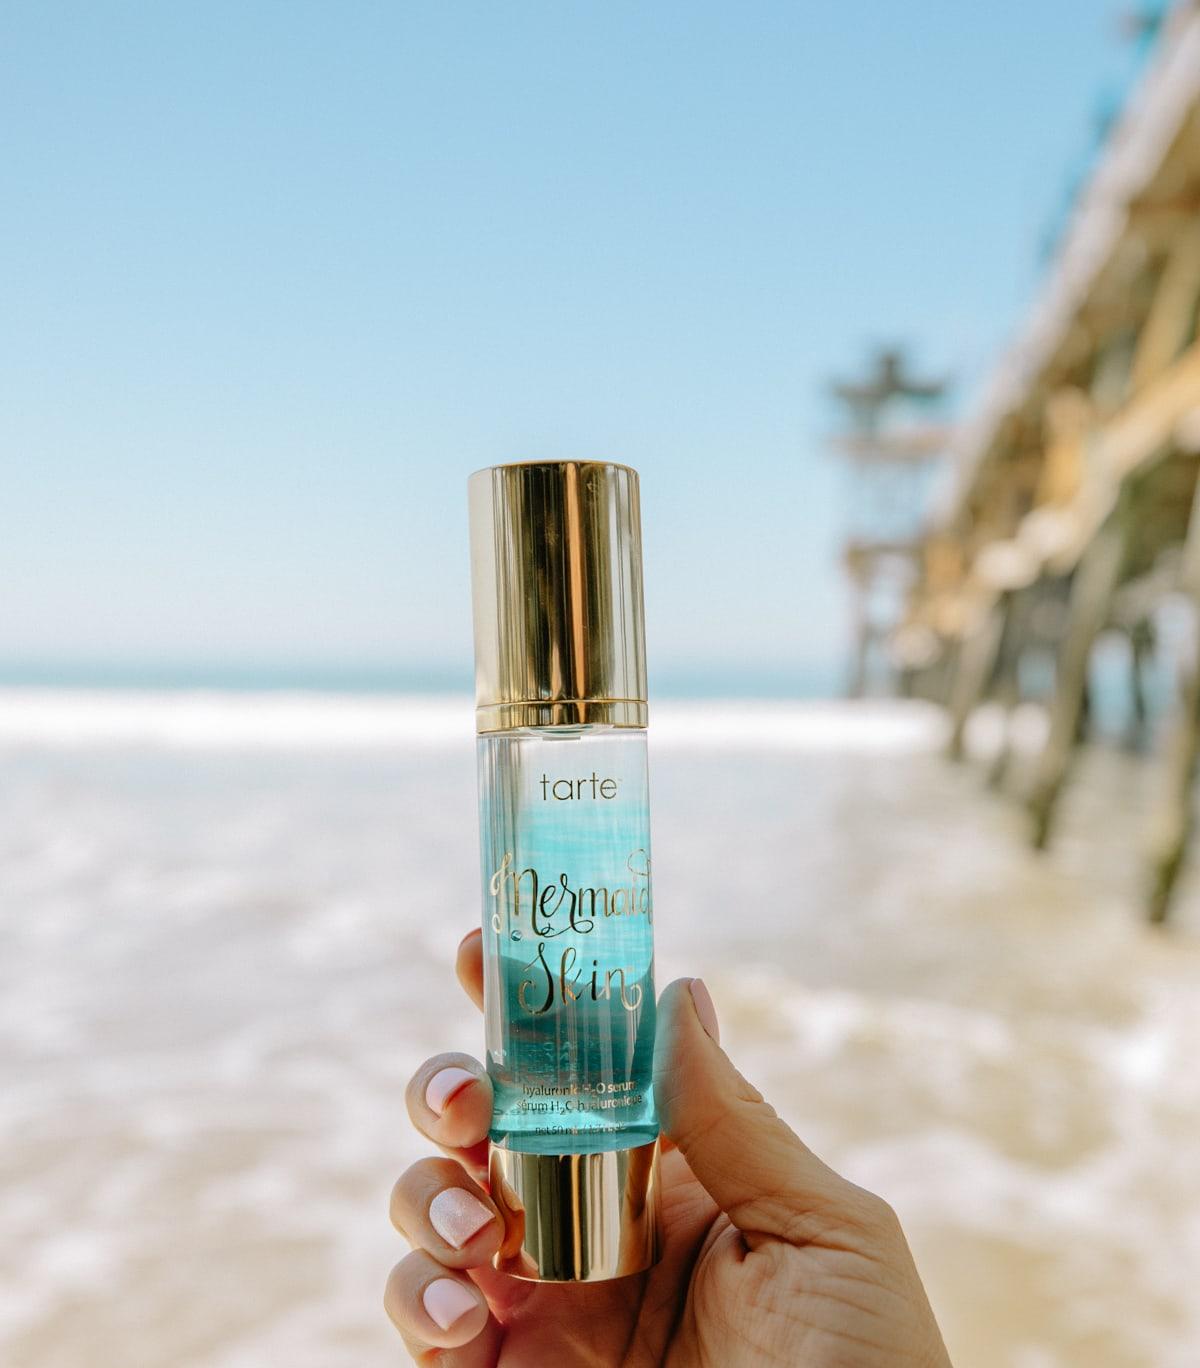 mermaid skin tarte cosmetics luxury skincare